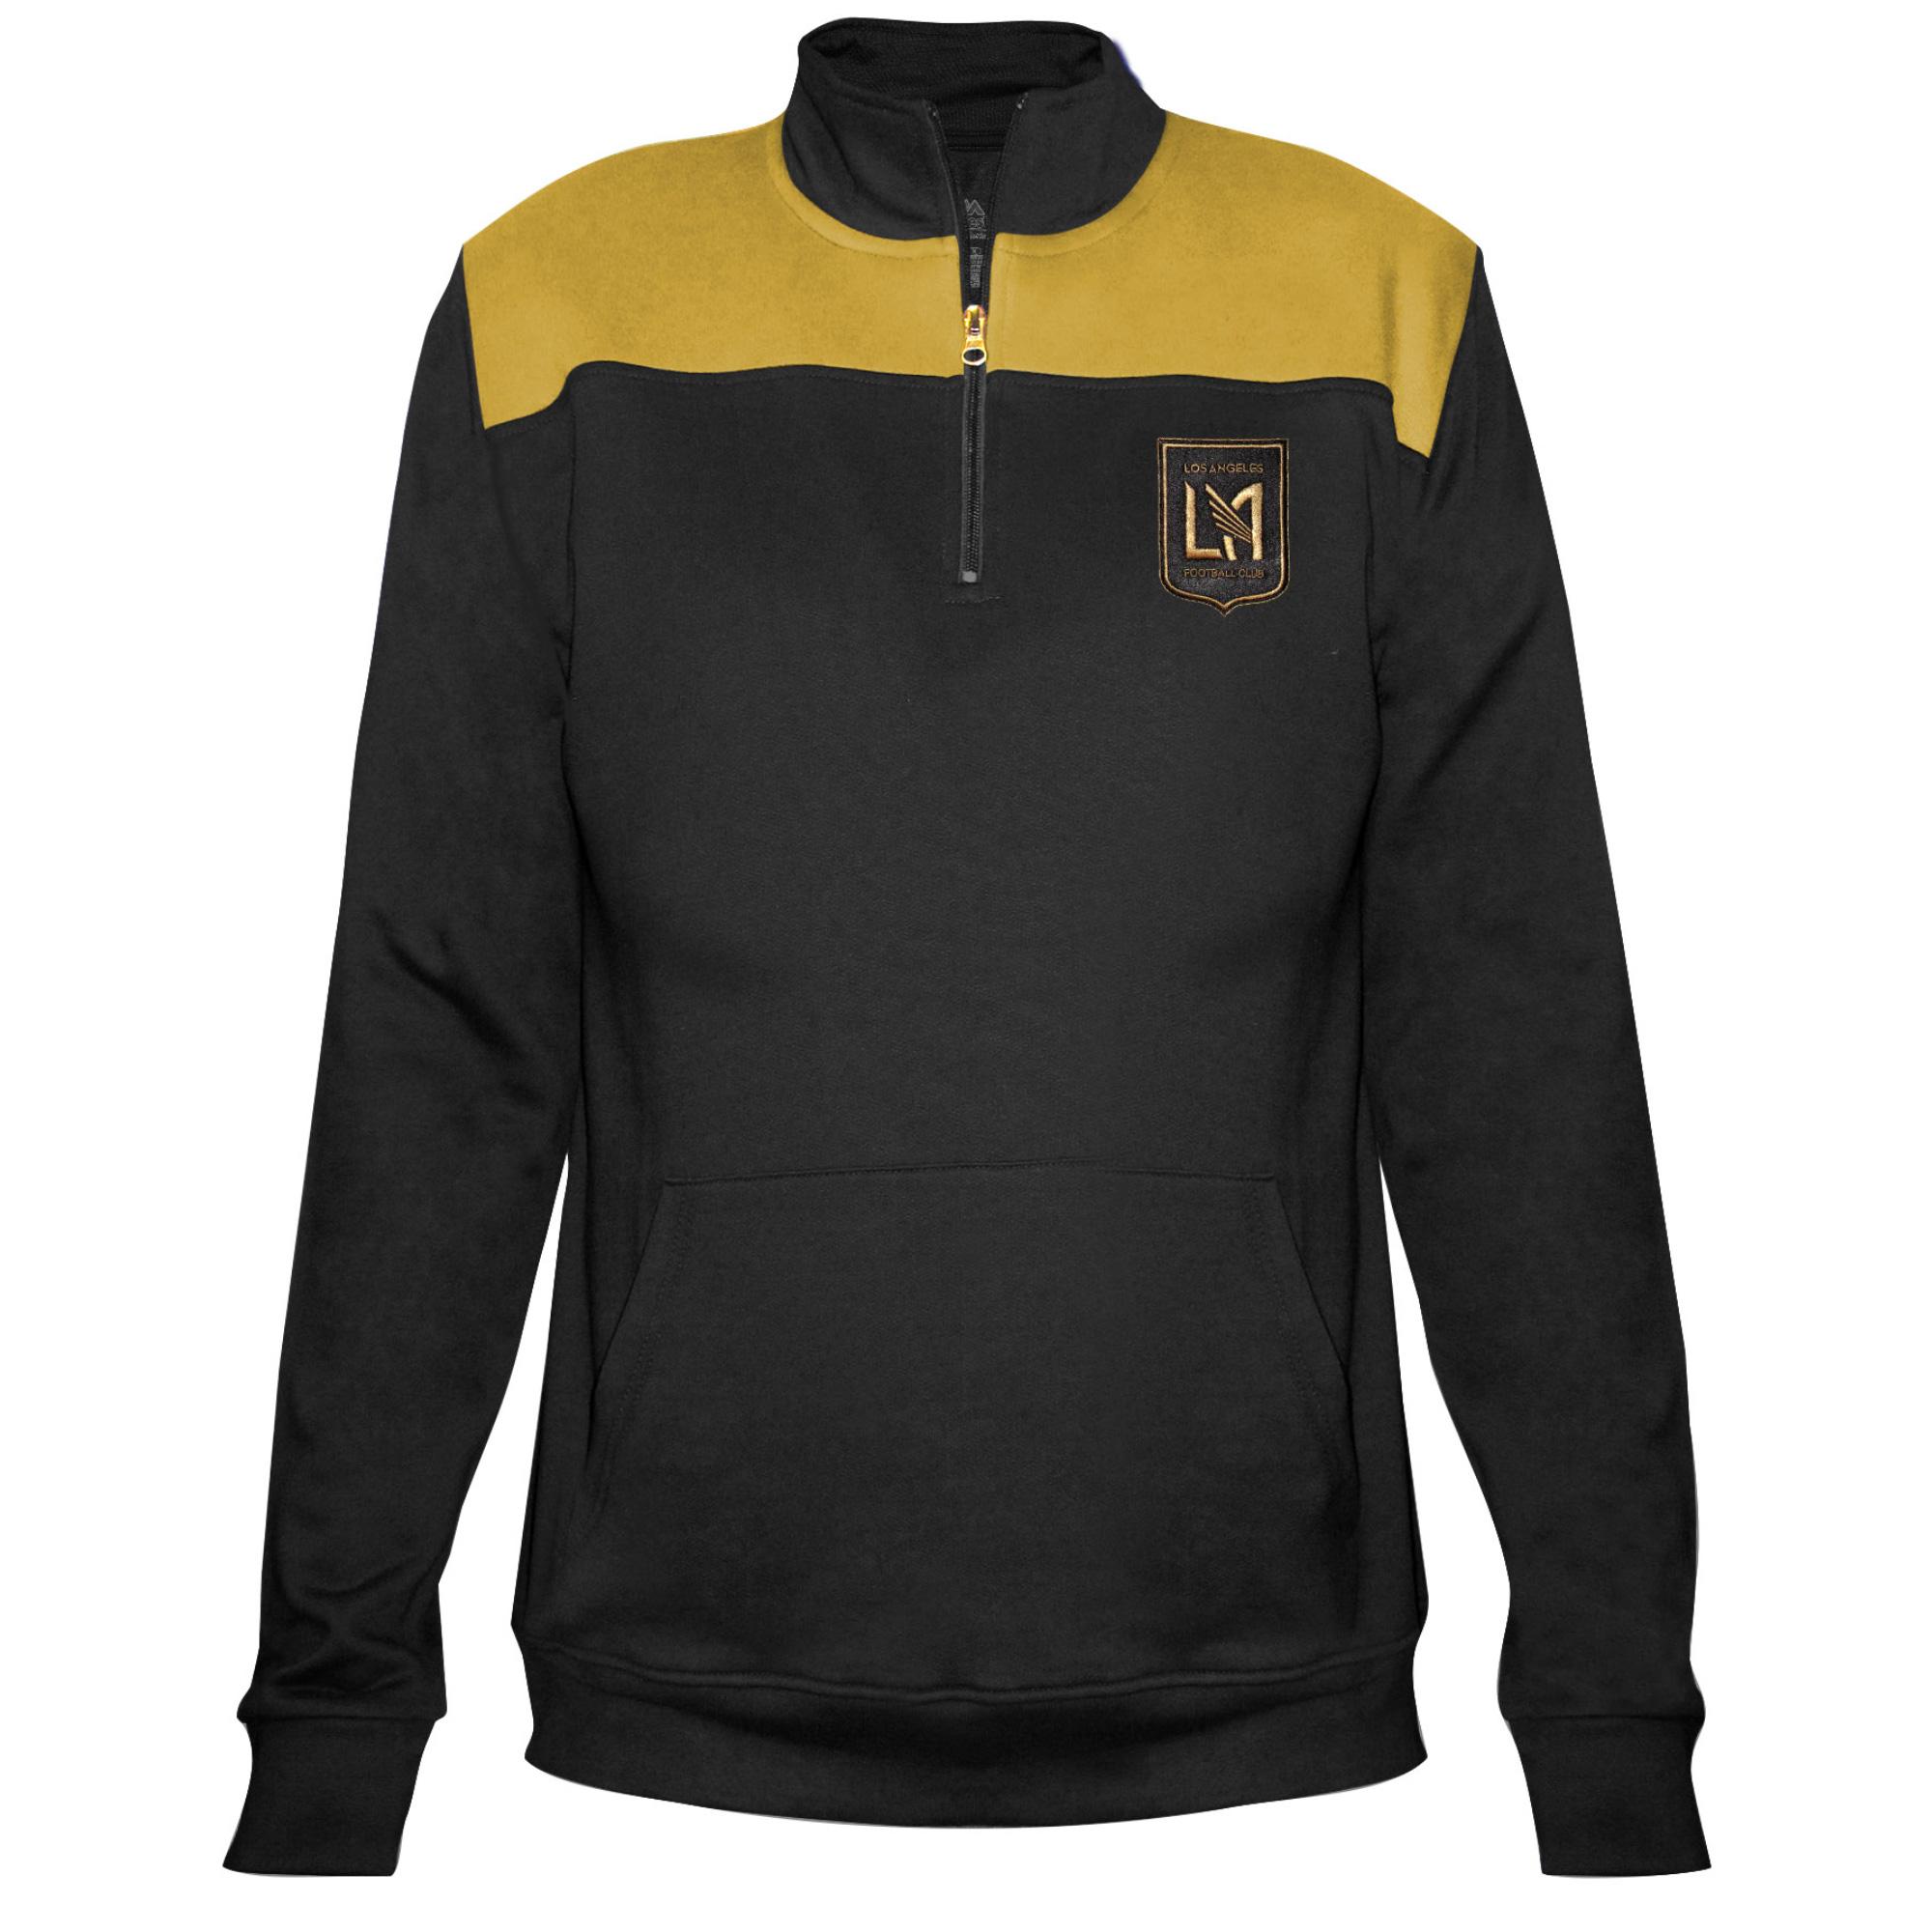 LAFC Majestic Women's 1/4-Zip Pullover Jacket - Black